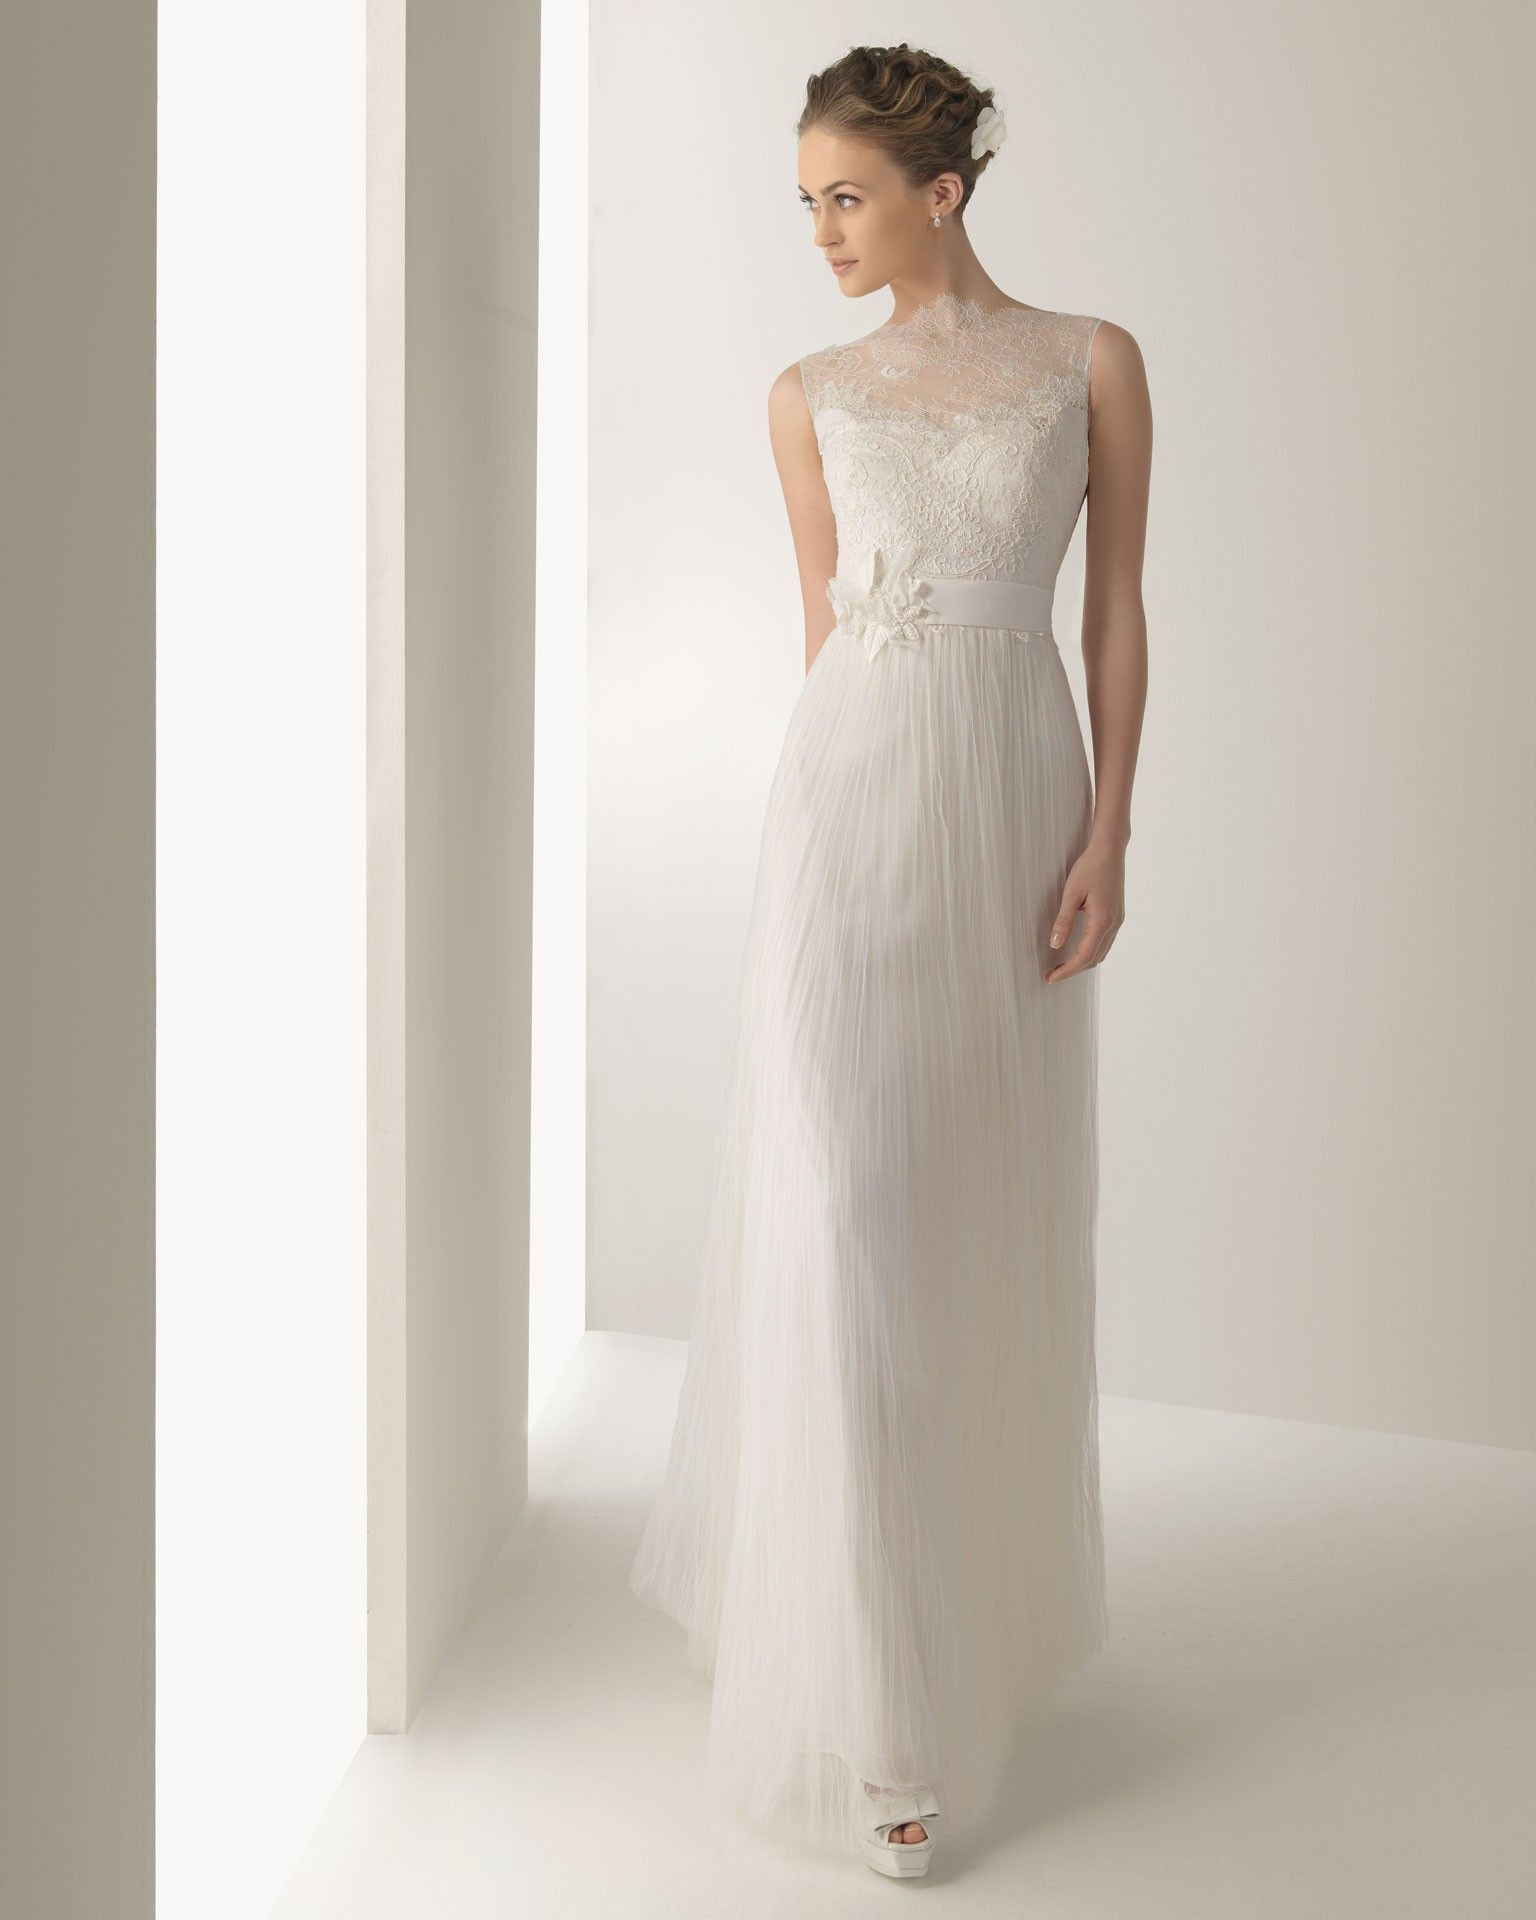 SOFT BY ROSA CLARÁ COLLECTION 2013 Wedding Dress And Petite Bride - Column Sheath Wedding Dresses